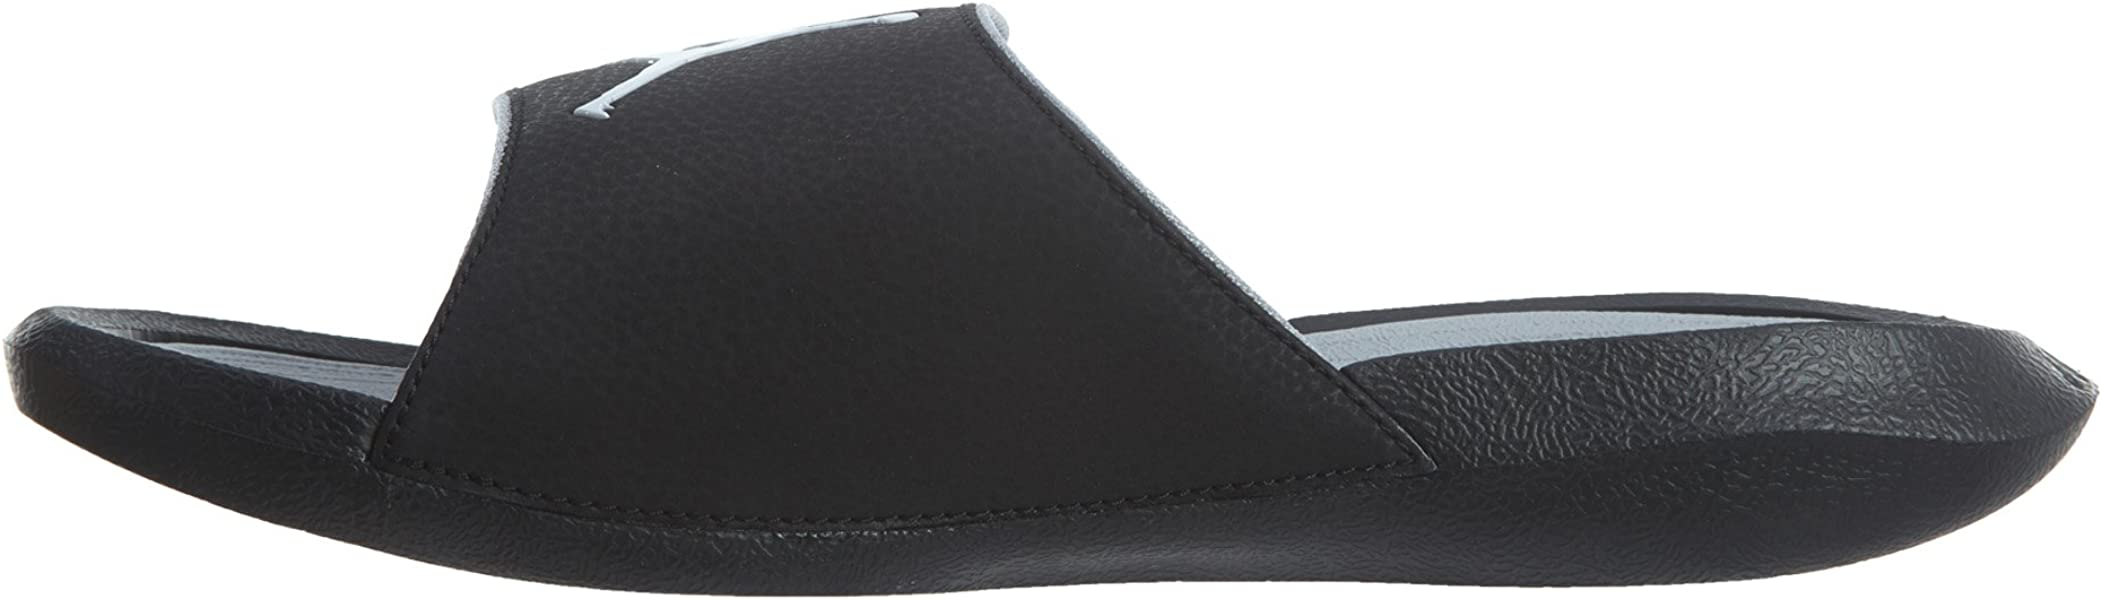 finest selection 01bde 59c24 Nike Mens Jordan Hydro 6 Black Grey Synthetic Sandals 10 US